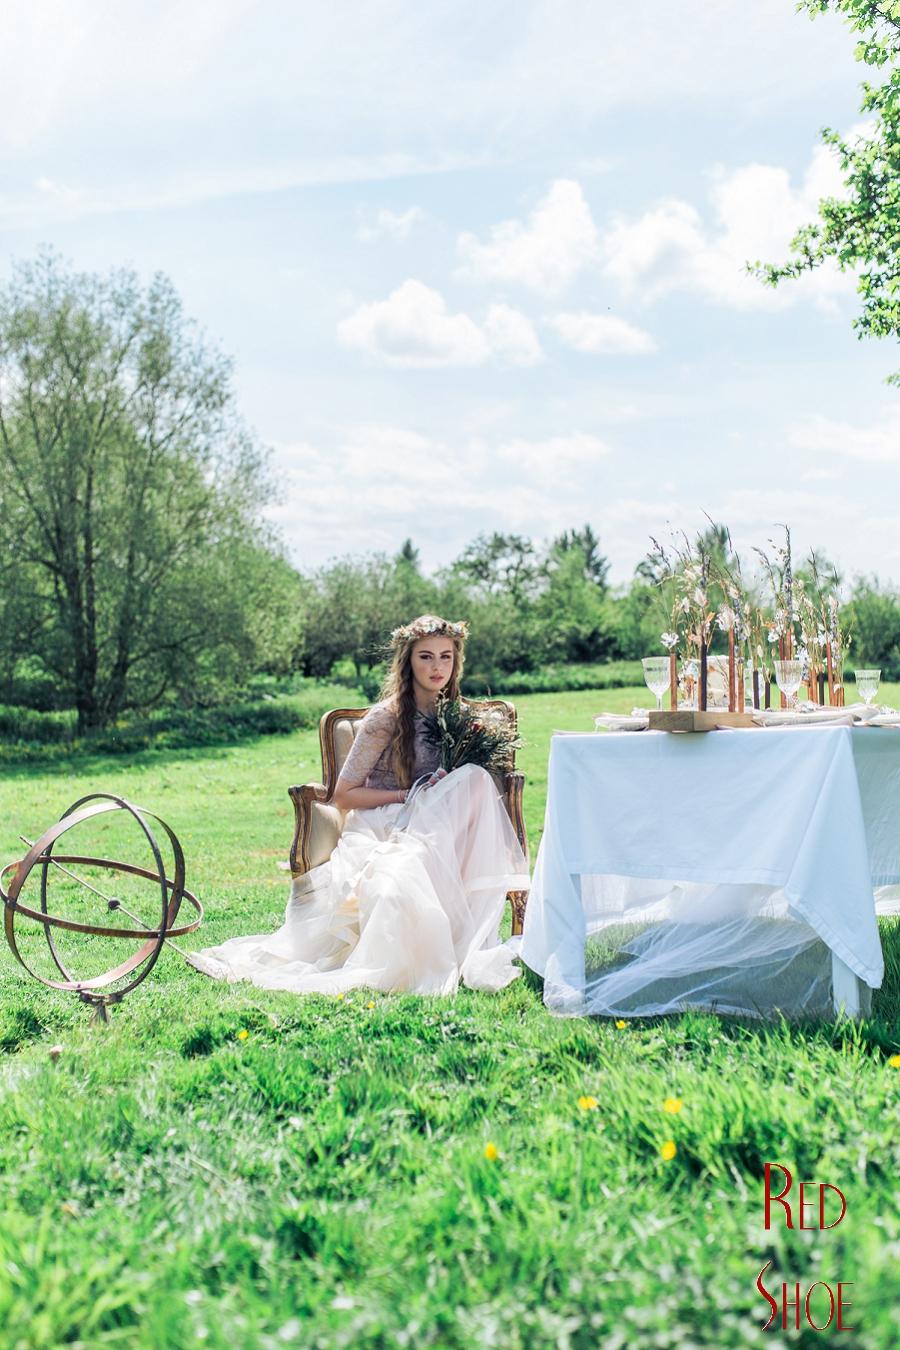 Boho bride, Glam Boho bride, Wedding inspiration, Styled wedding photo shoot, wedding ideas, wedding flower ideas, wedding photography, dried wedding flowers, boho bride makeup ideas_0088.jpg